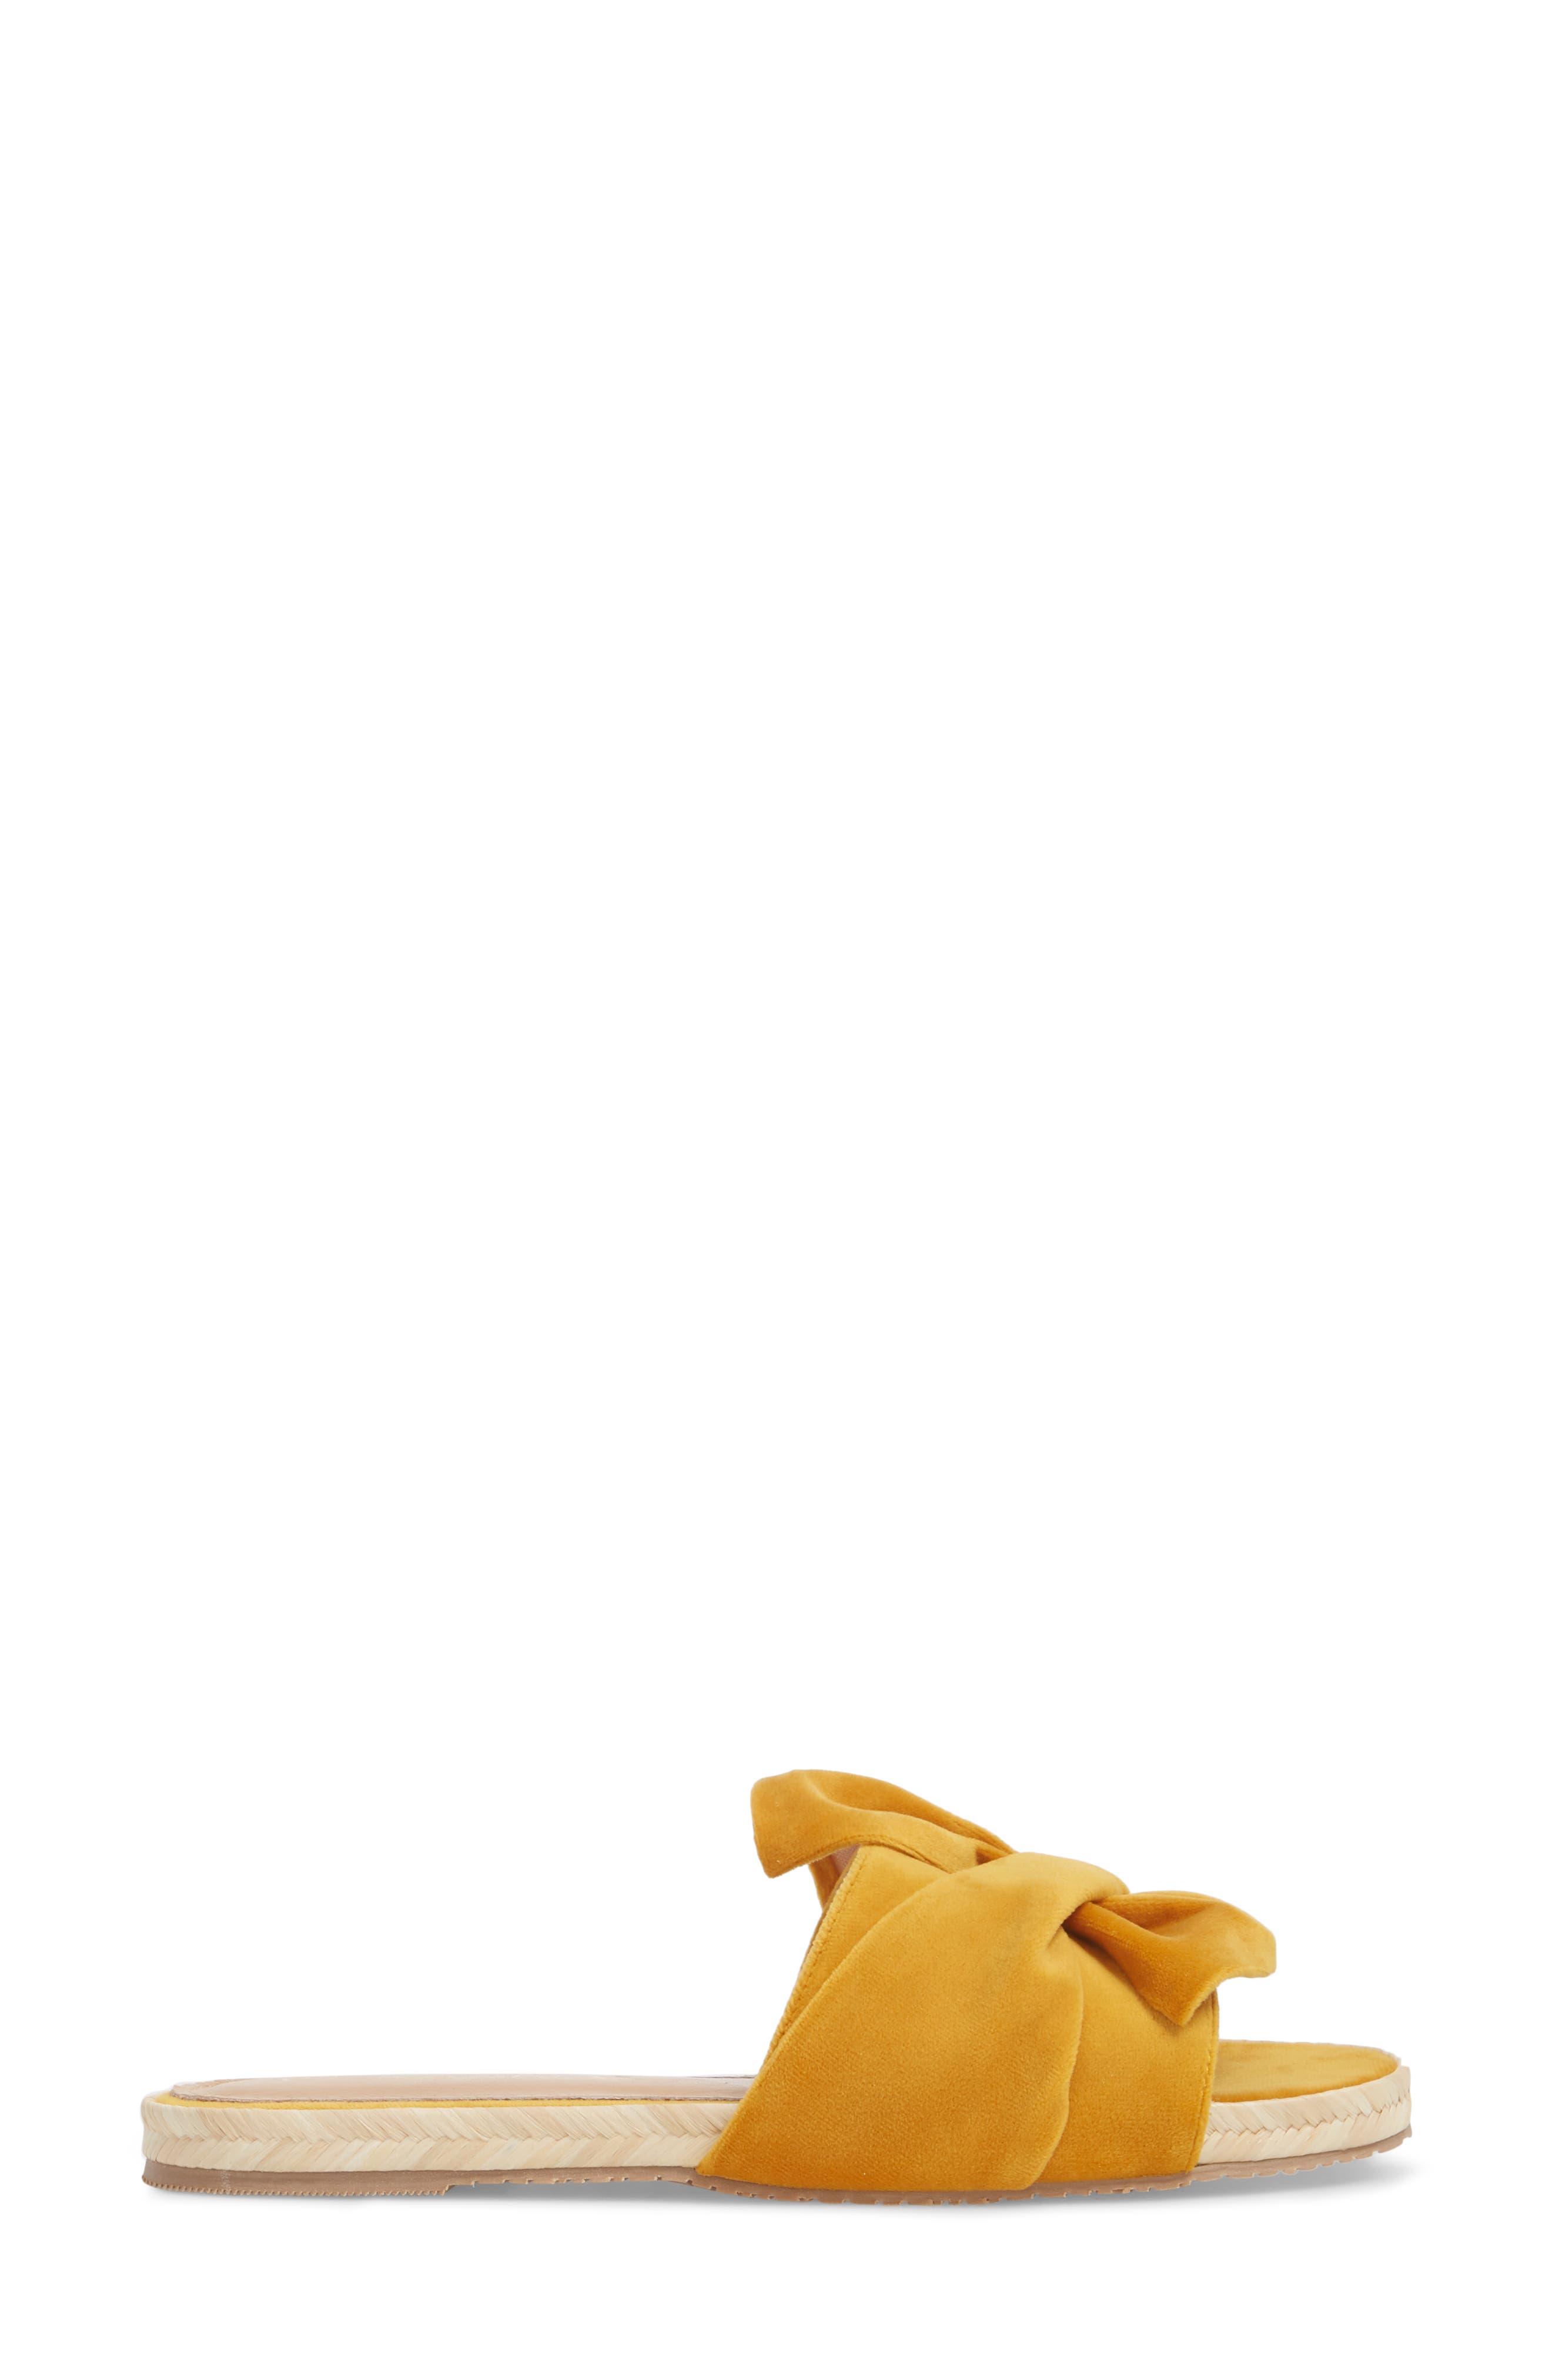 Sausalito Knotted Slide Sandal,                             Alternate thumbnail 6, color,